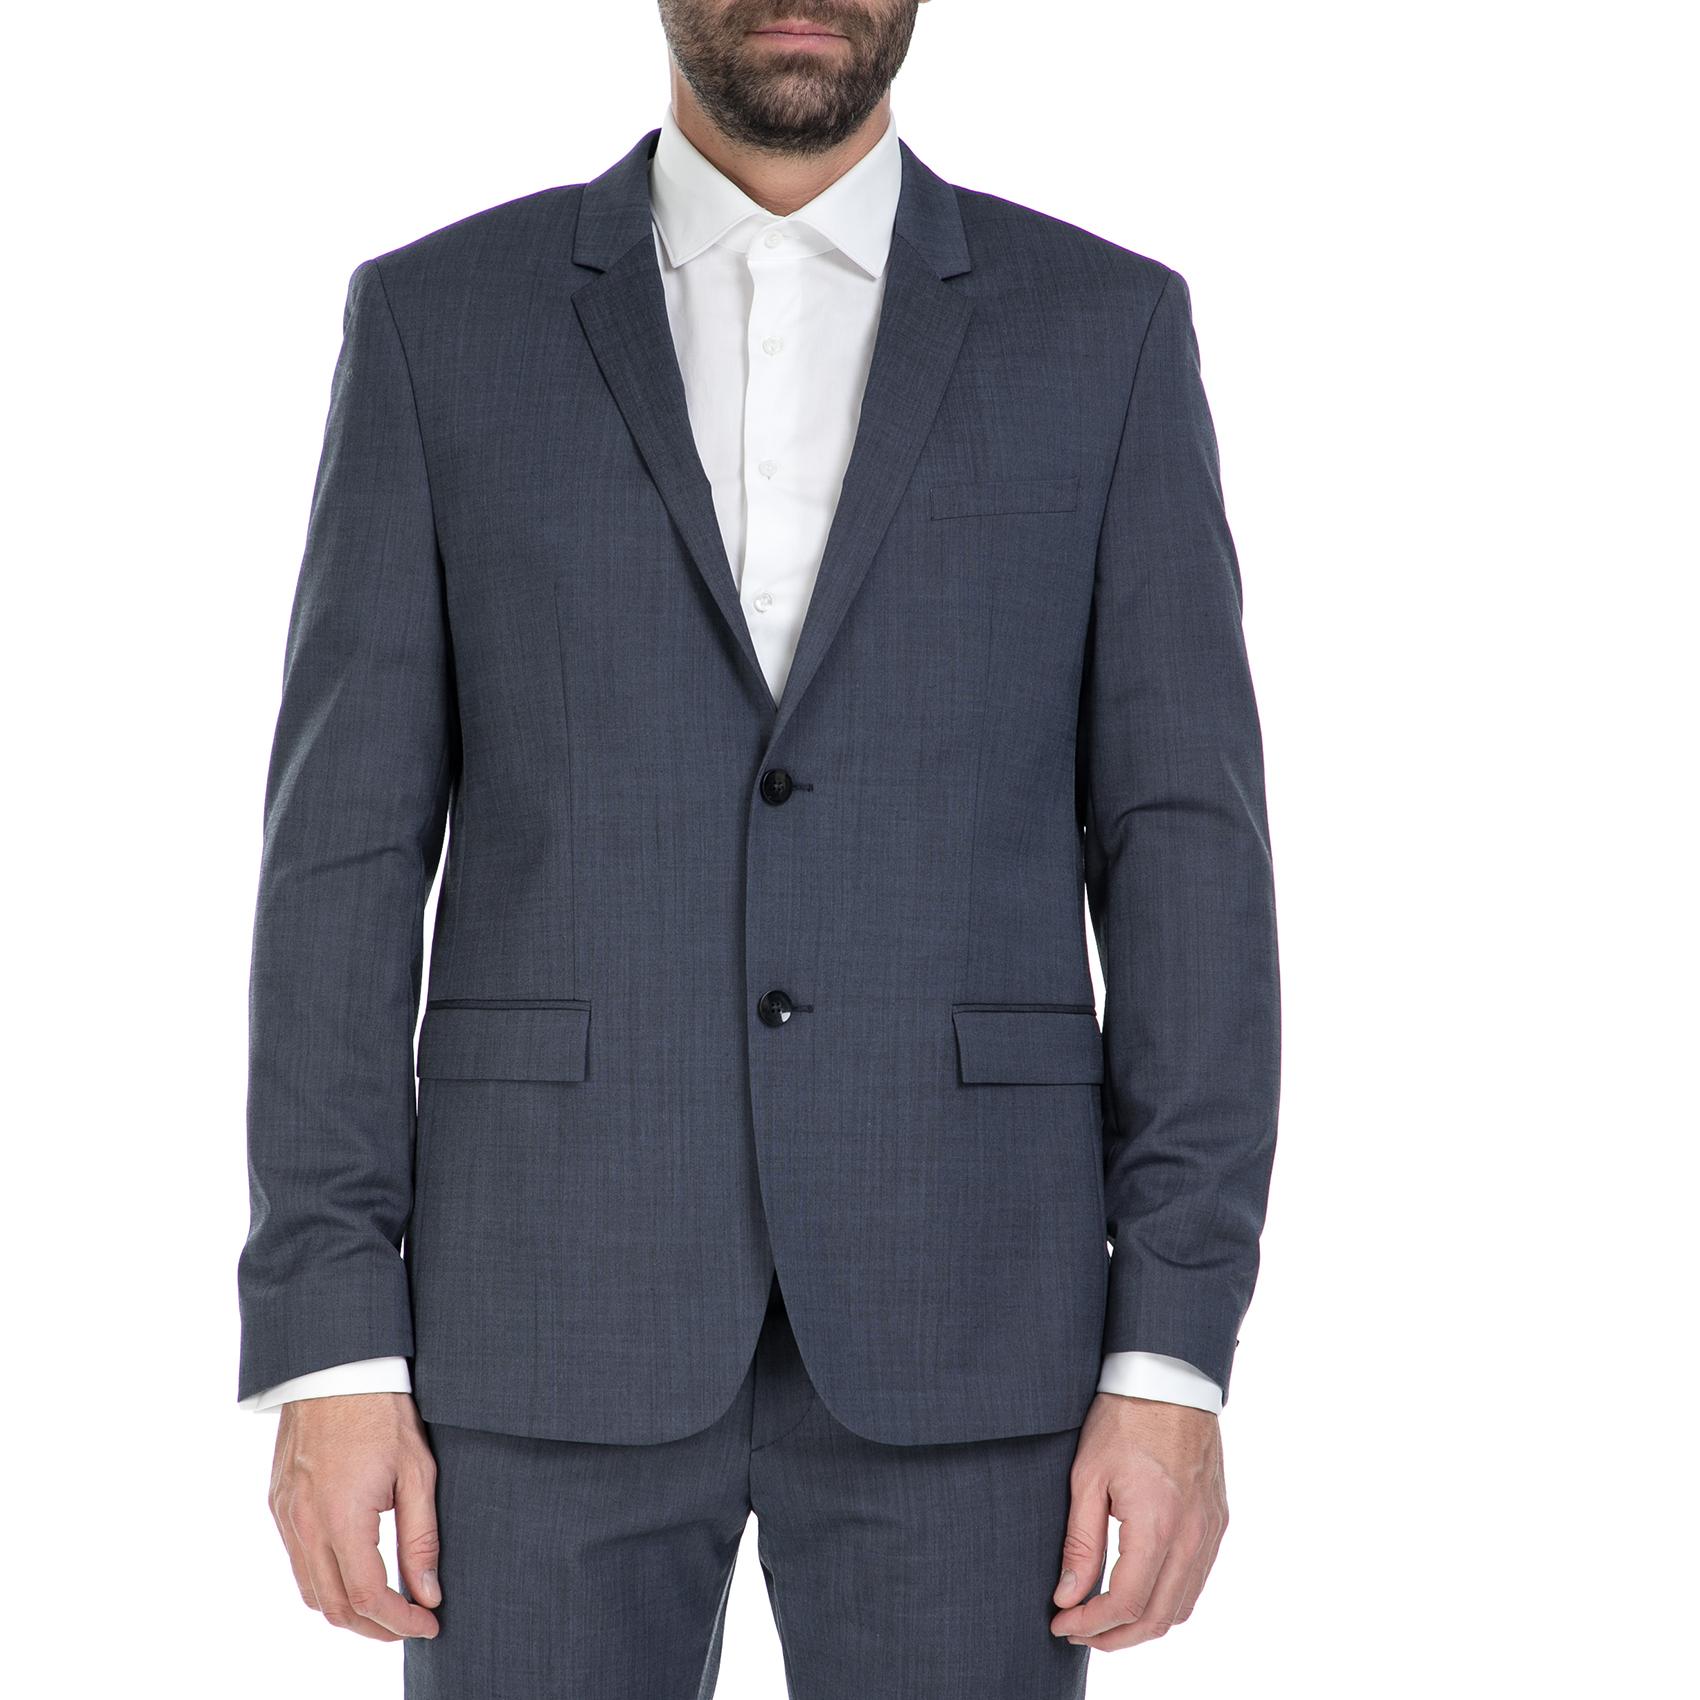 CK – Ανδρικό σακάκι CK TATE σκούρο γκρι